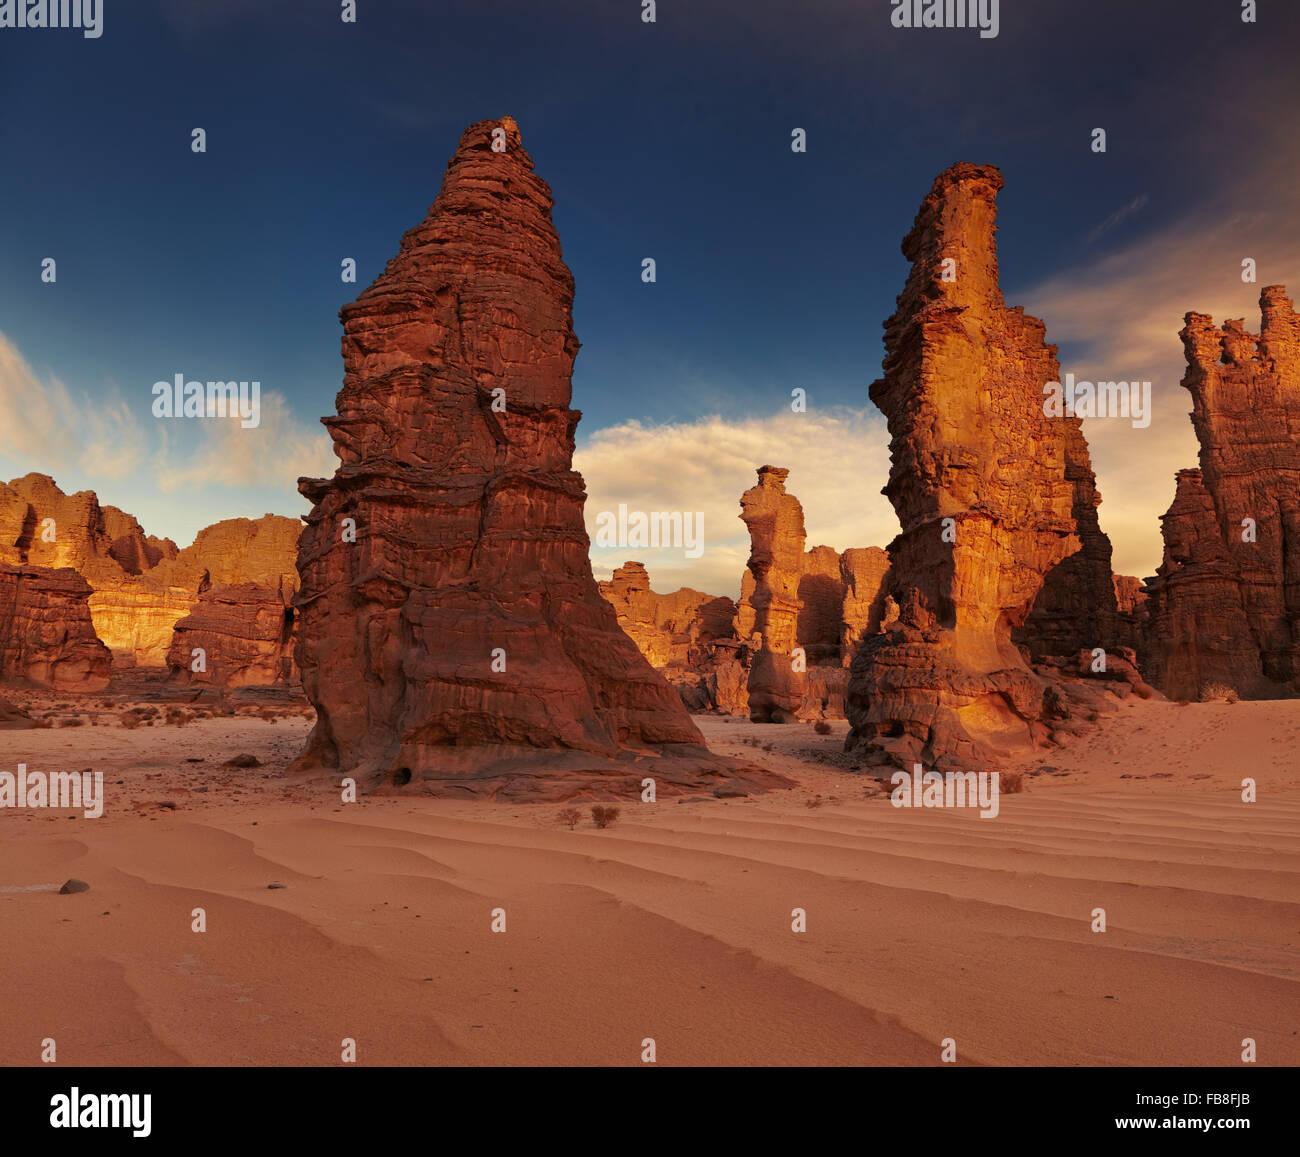 Les roches du désert du Sahara, Tassili N'Ajjer, Algérie Photo Stock